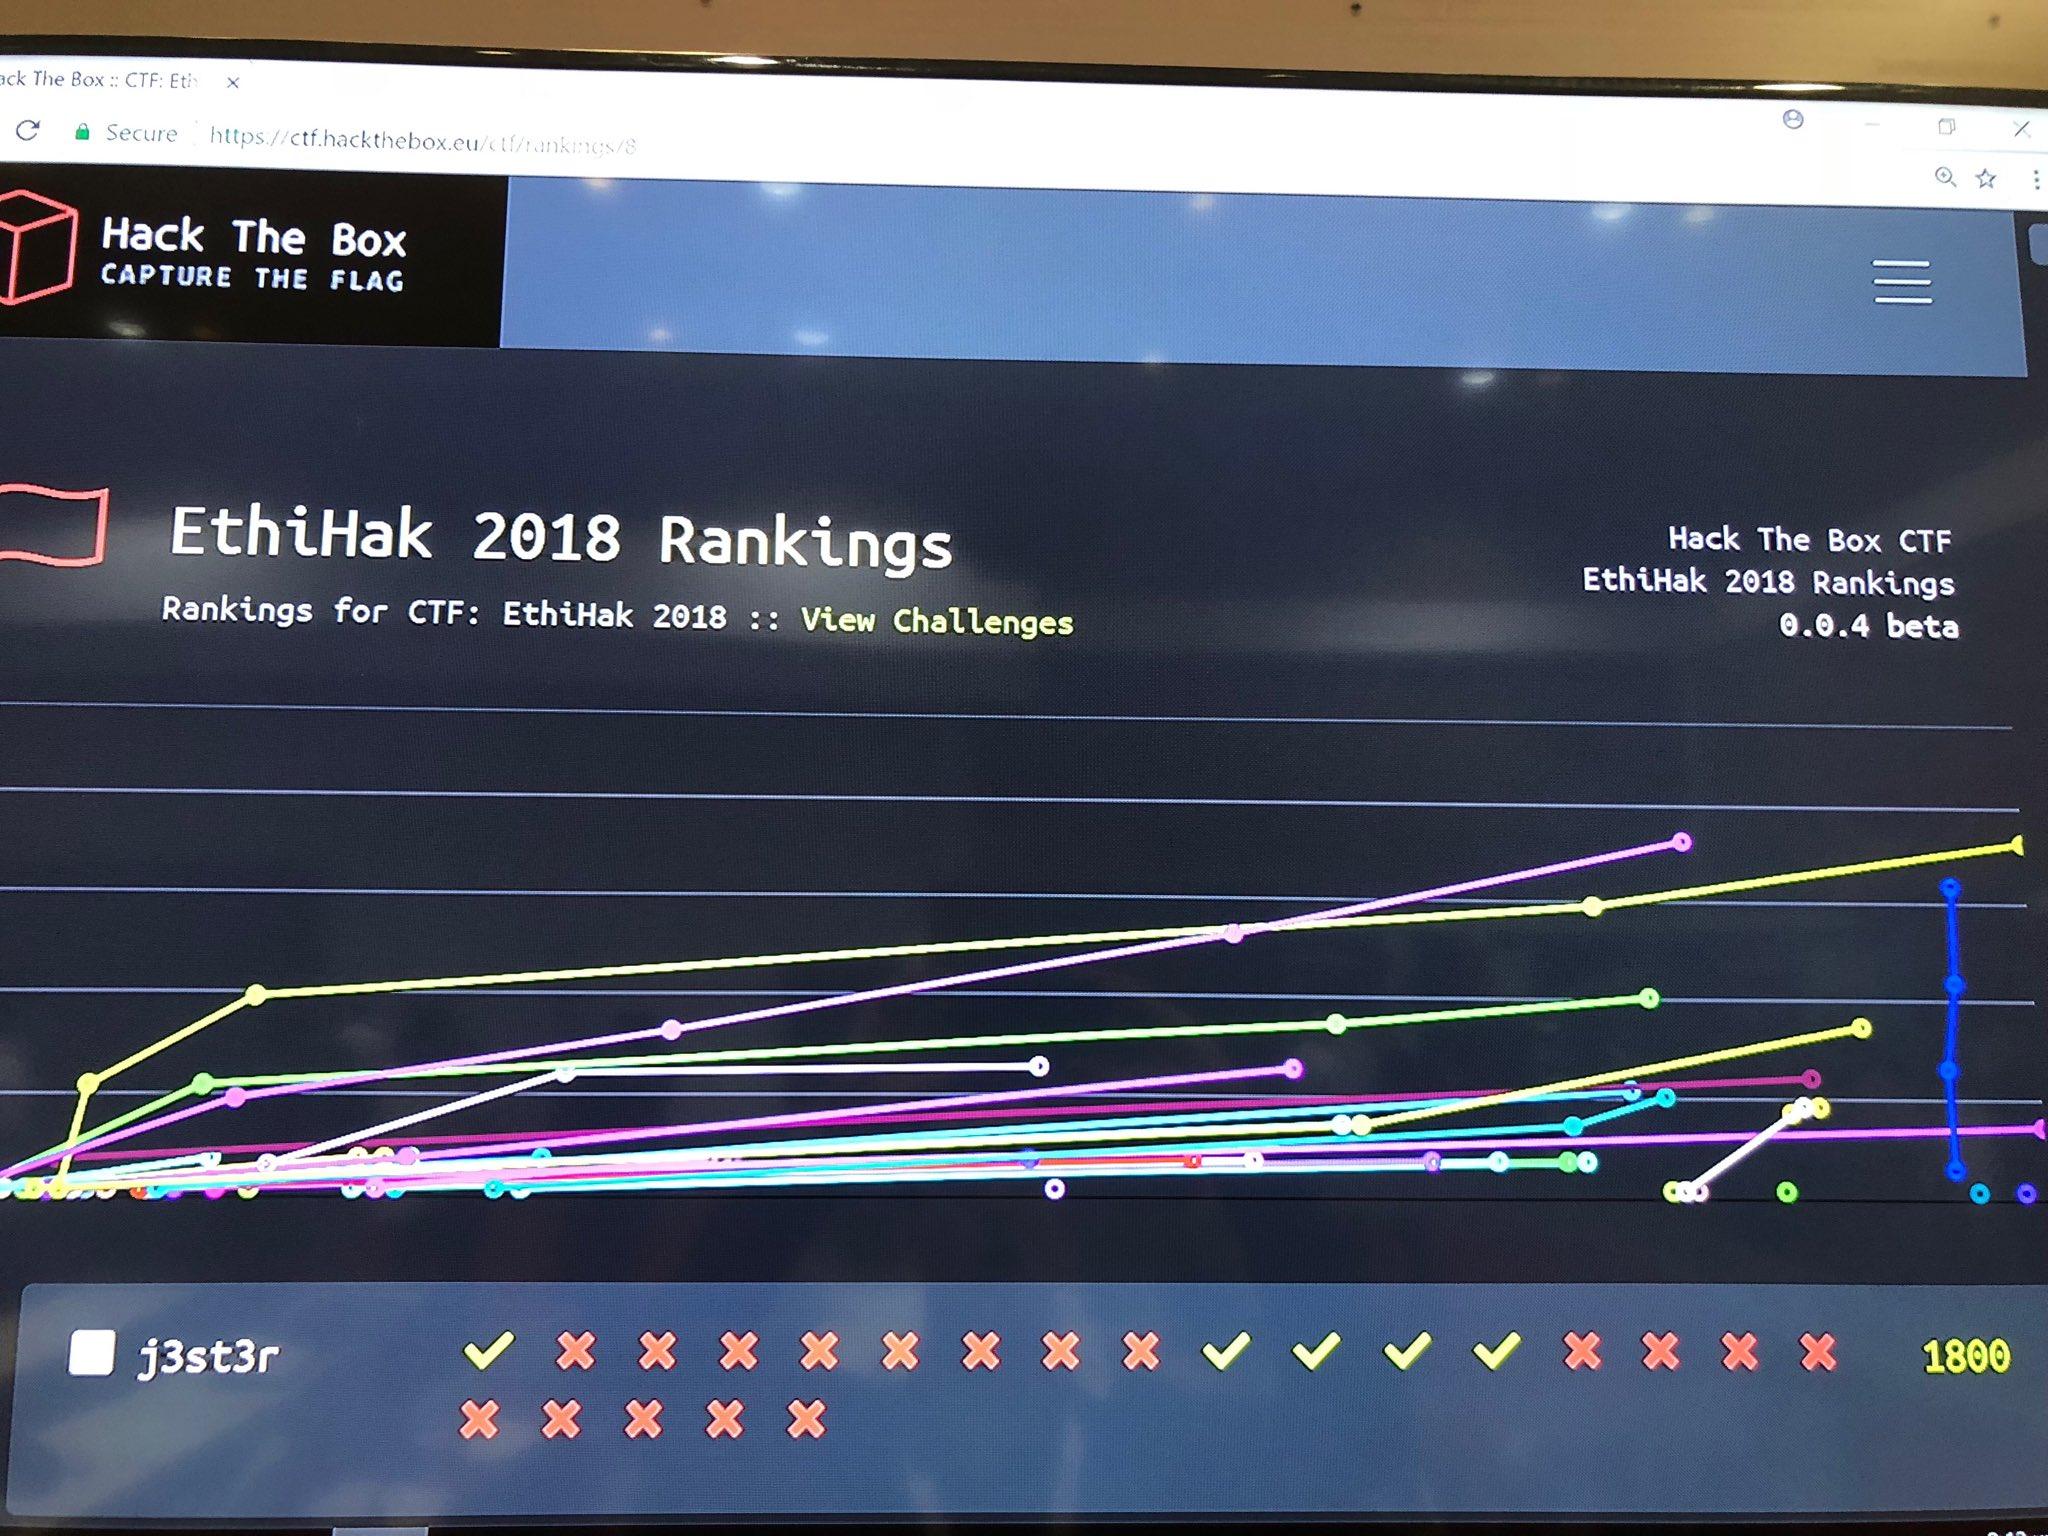 Hack The Box Ranking